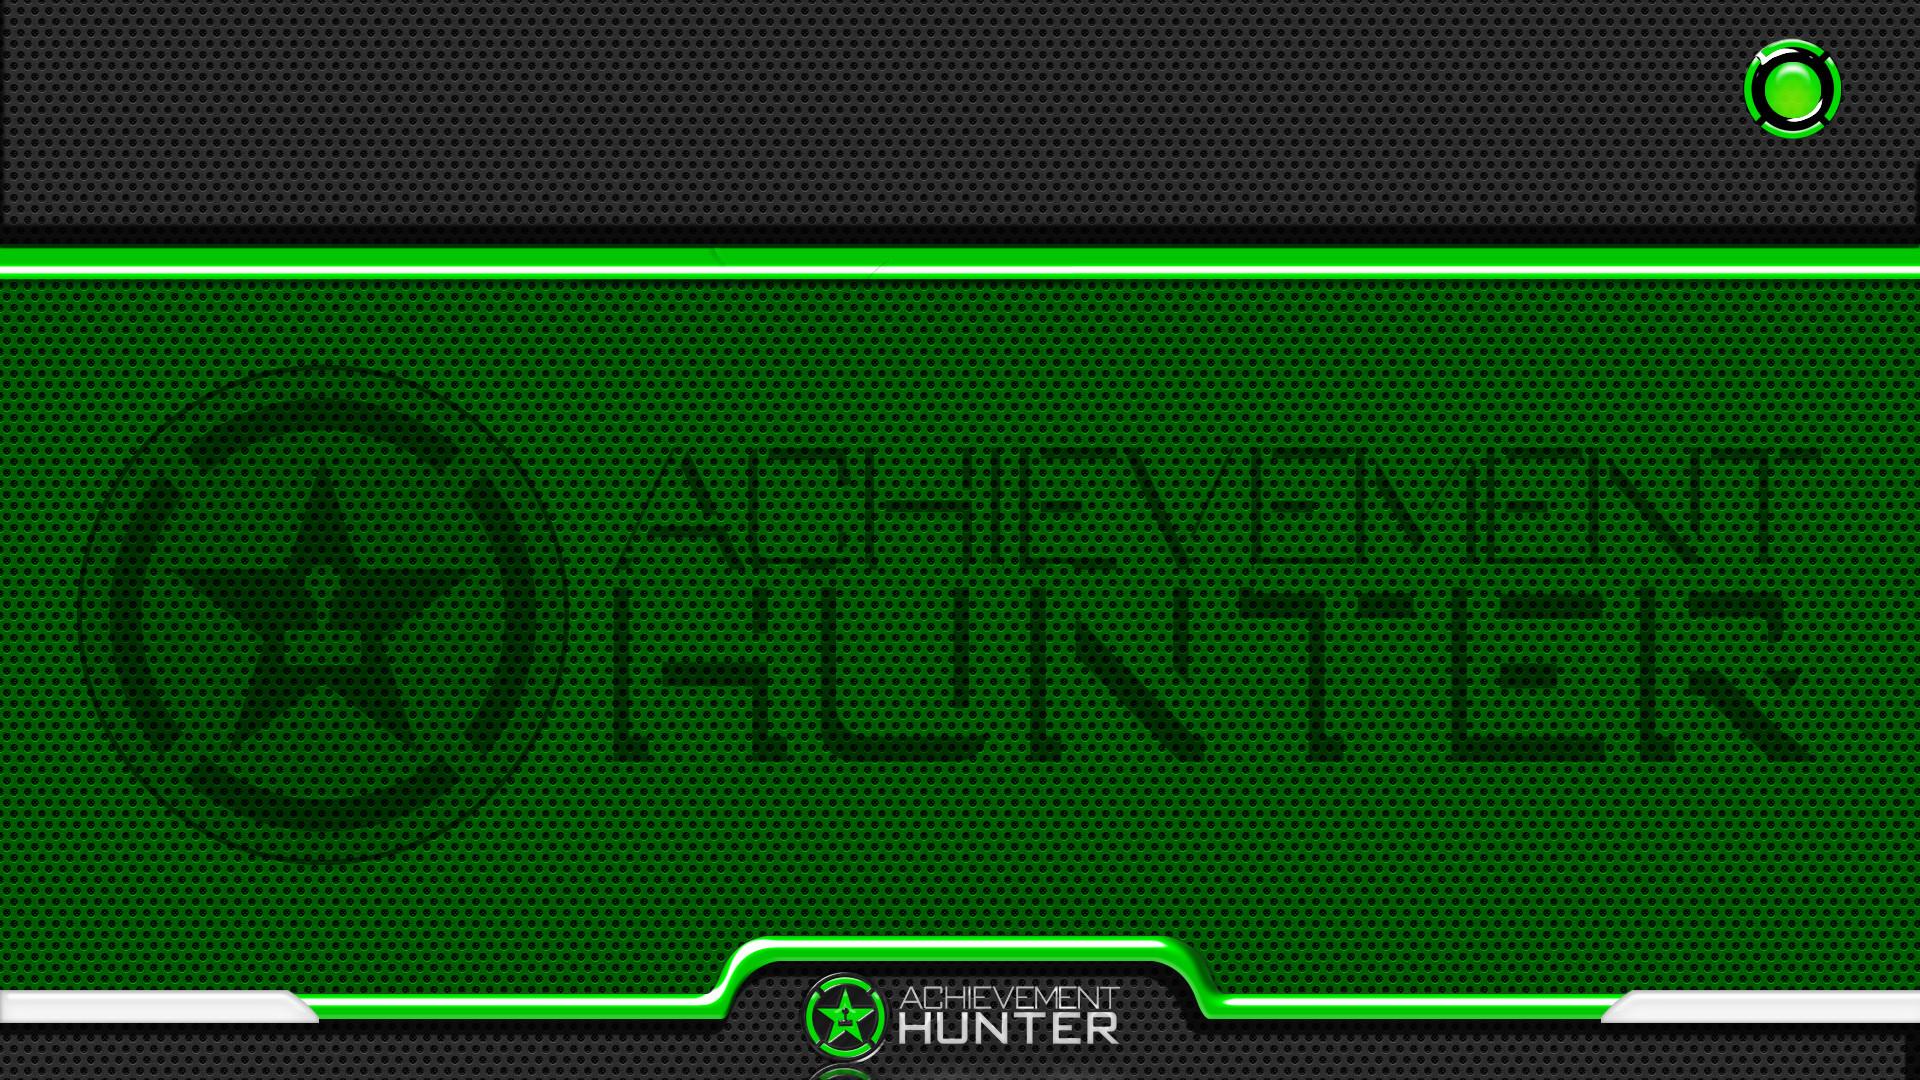 Achievement Hunter Xbox One Wallpaper (81+ images)